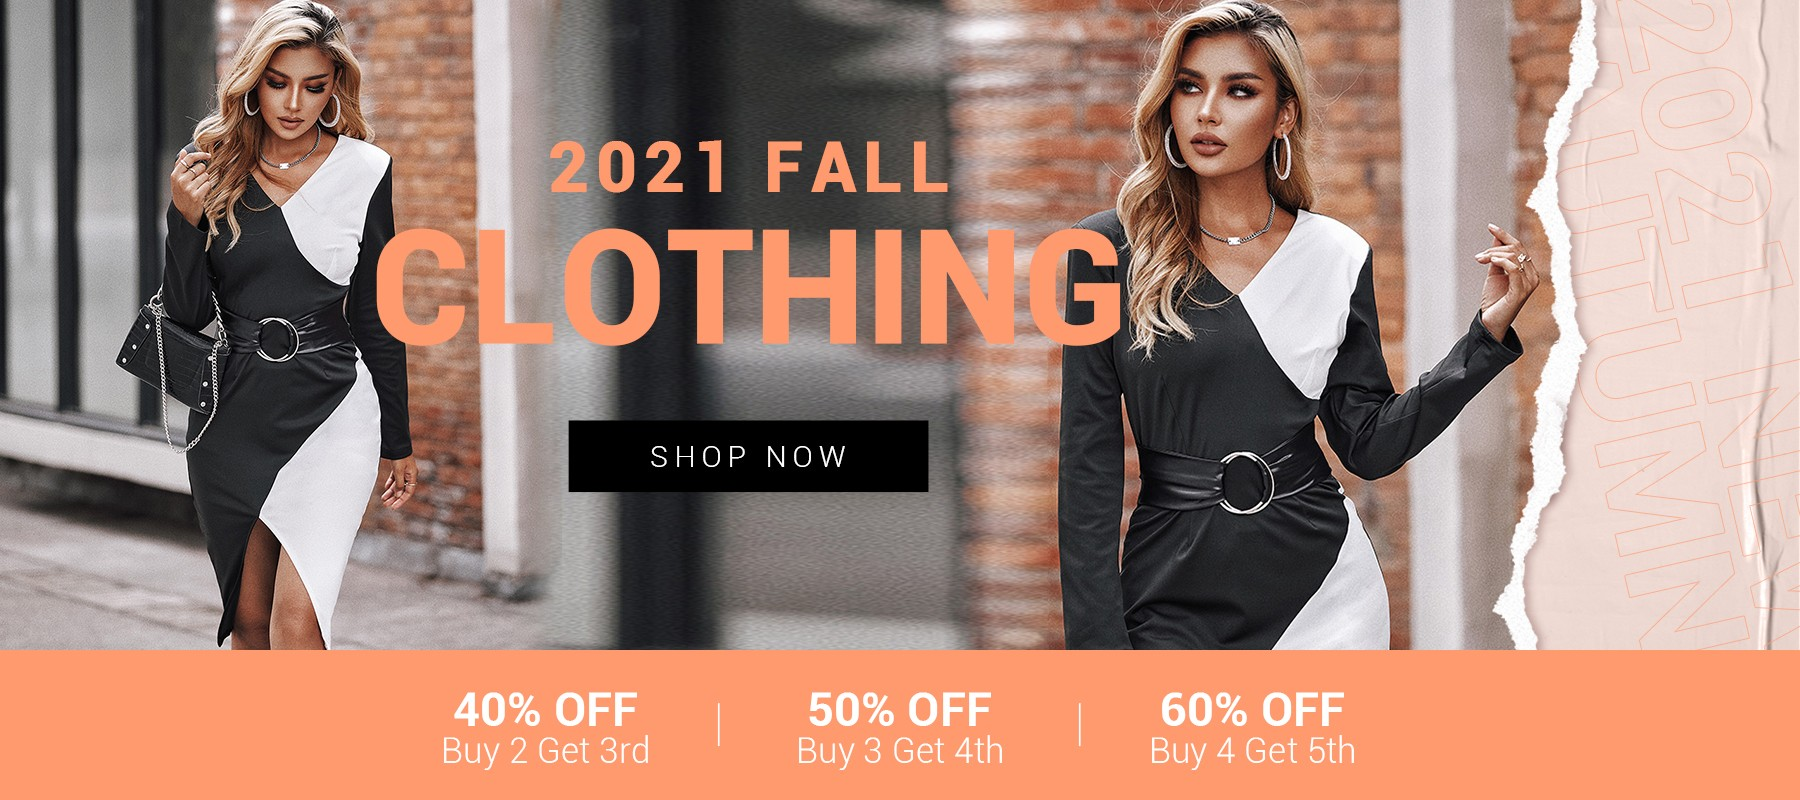 Fall Clothing 2021